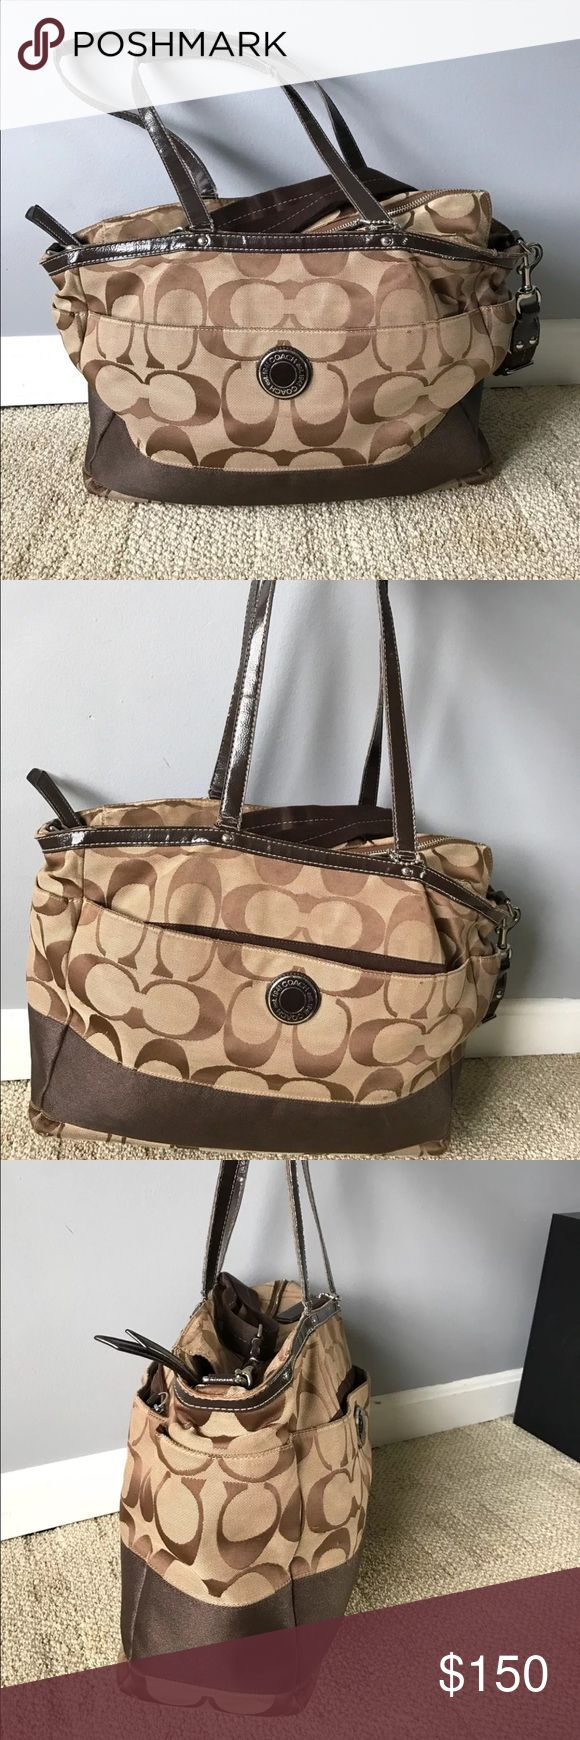 Coach diaper bag In GUC. Coach diaper bag, authentic! Coach Bags Baby Bags